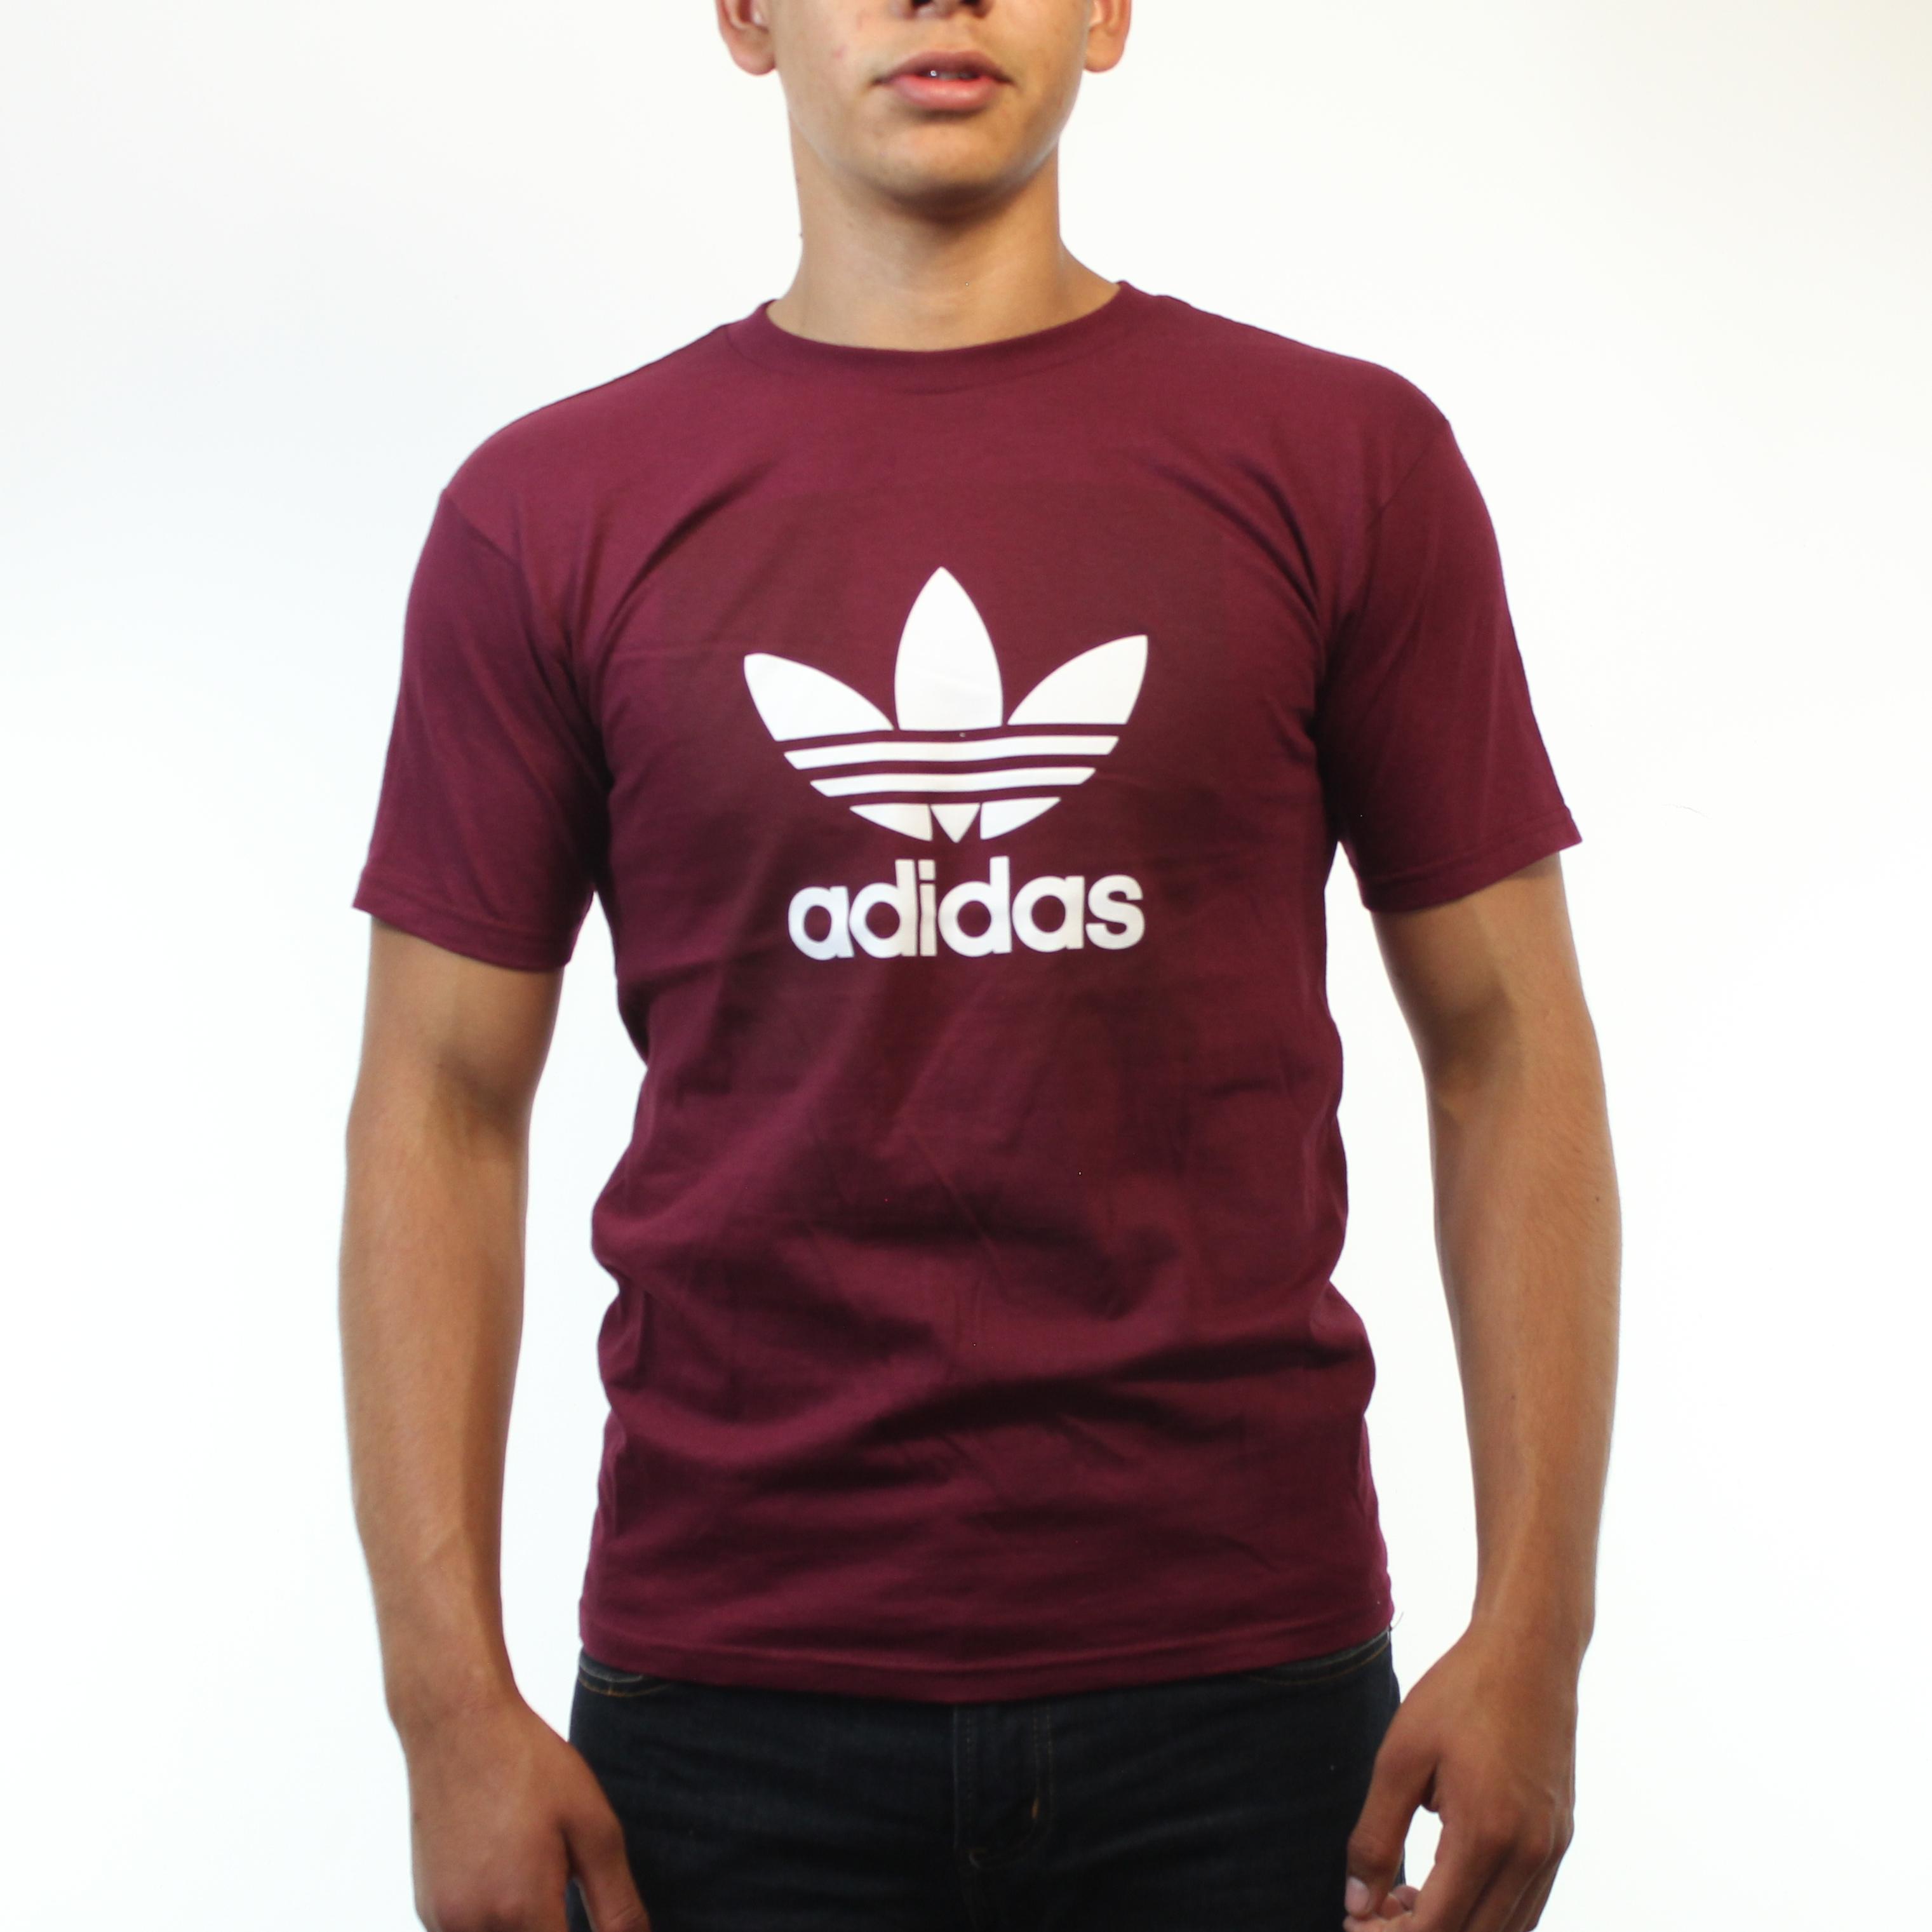 Adidas classic logo white color trefoil men 39 s burgundy t for Adidas classic t shirt